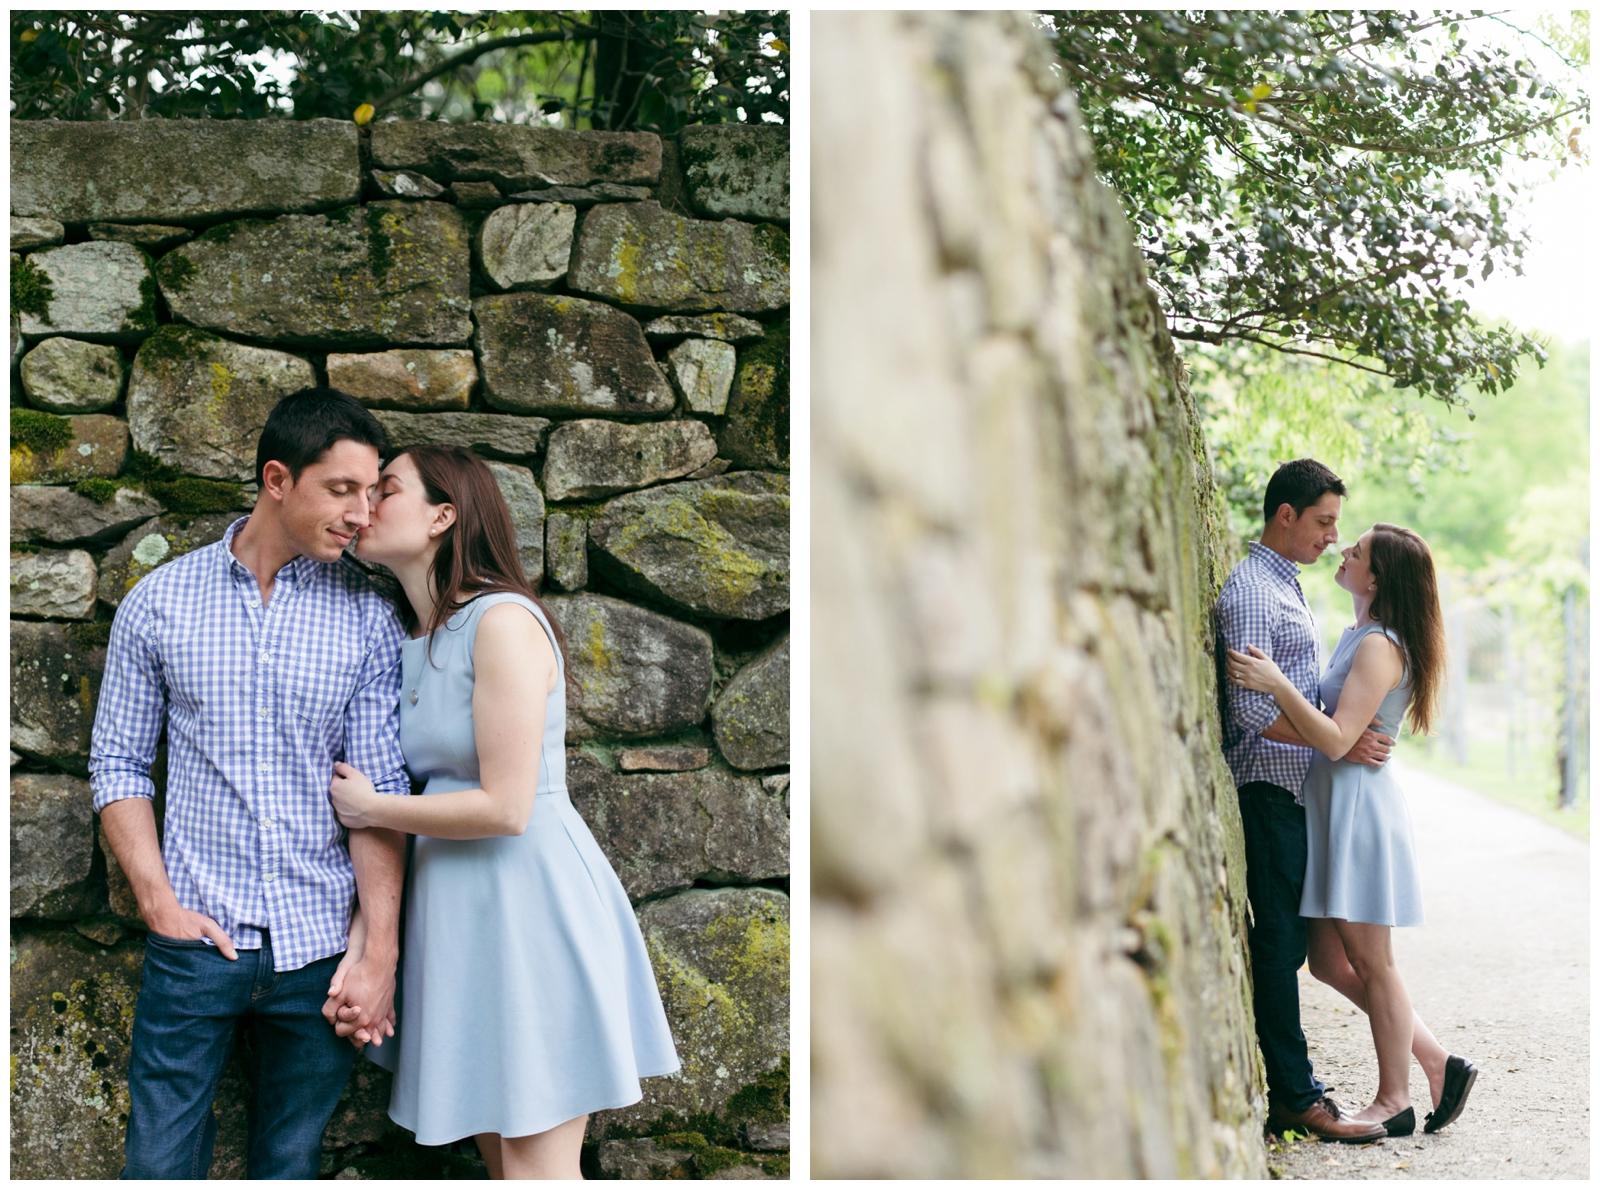 Arnold-Arboretum-Engagement-Boston-Wedding-Photographer-Bailey-Q-Photo-013.jpg